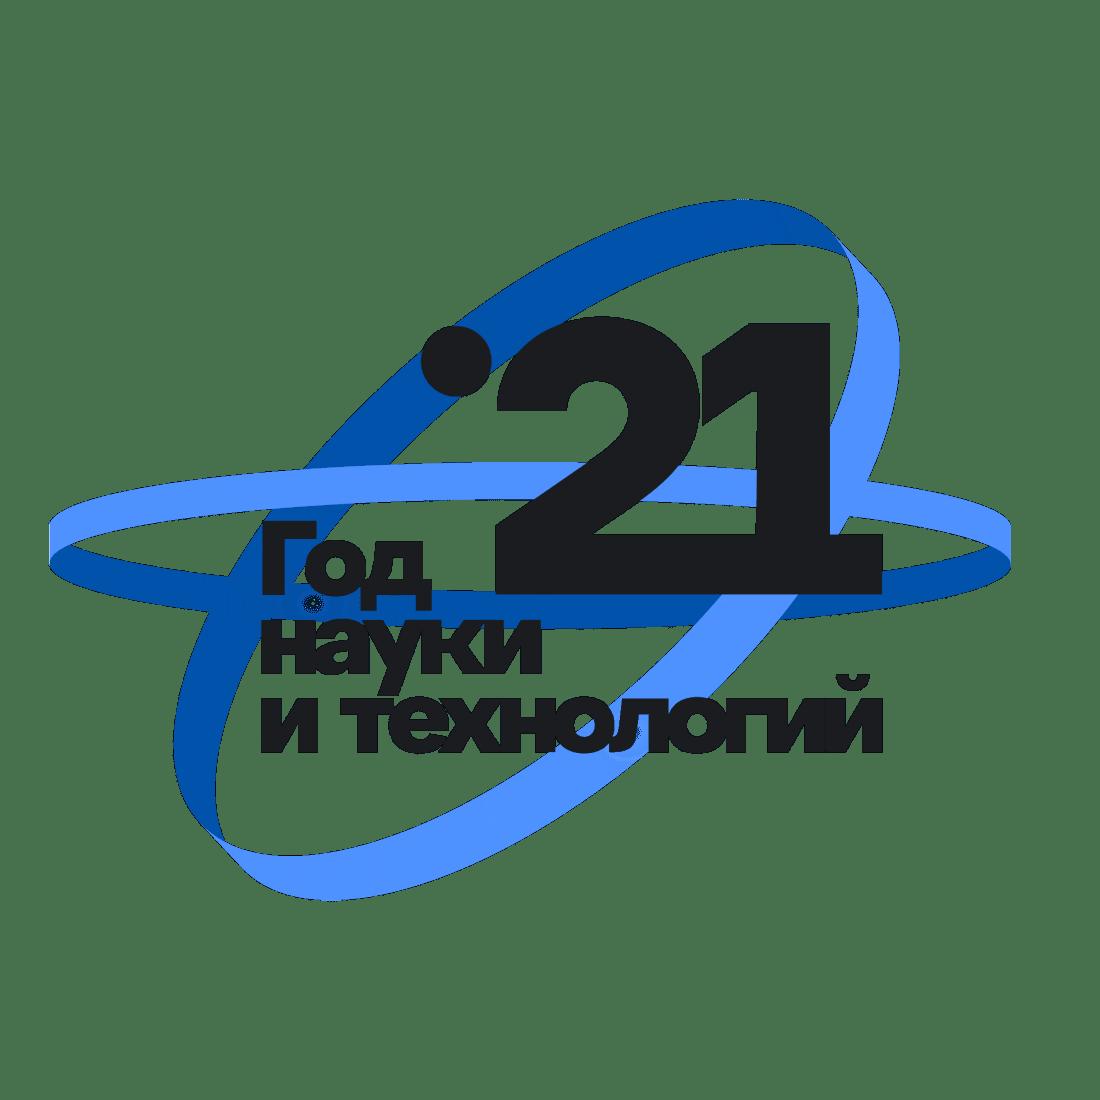 лого год науки